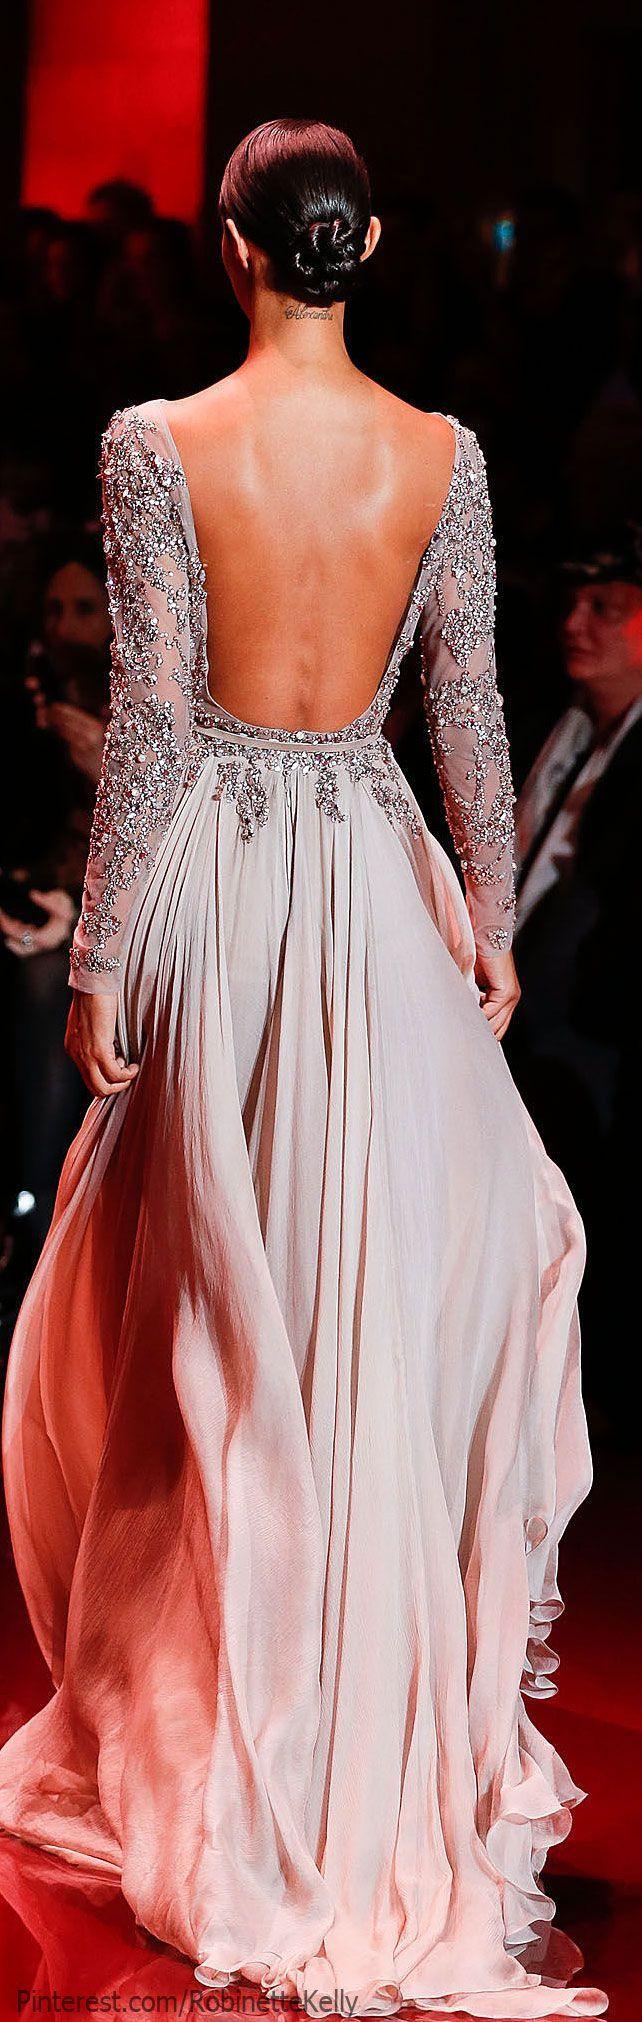 Tendance Robe De Mariee 2017 2018 Elie Saab Haute Couture F W